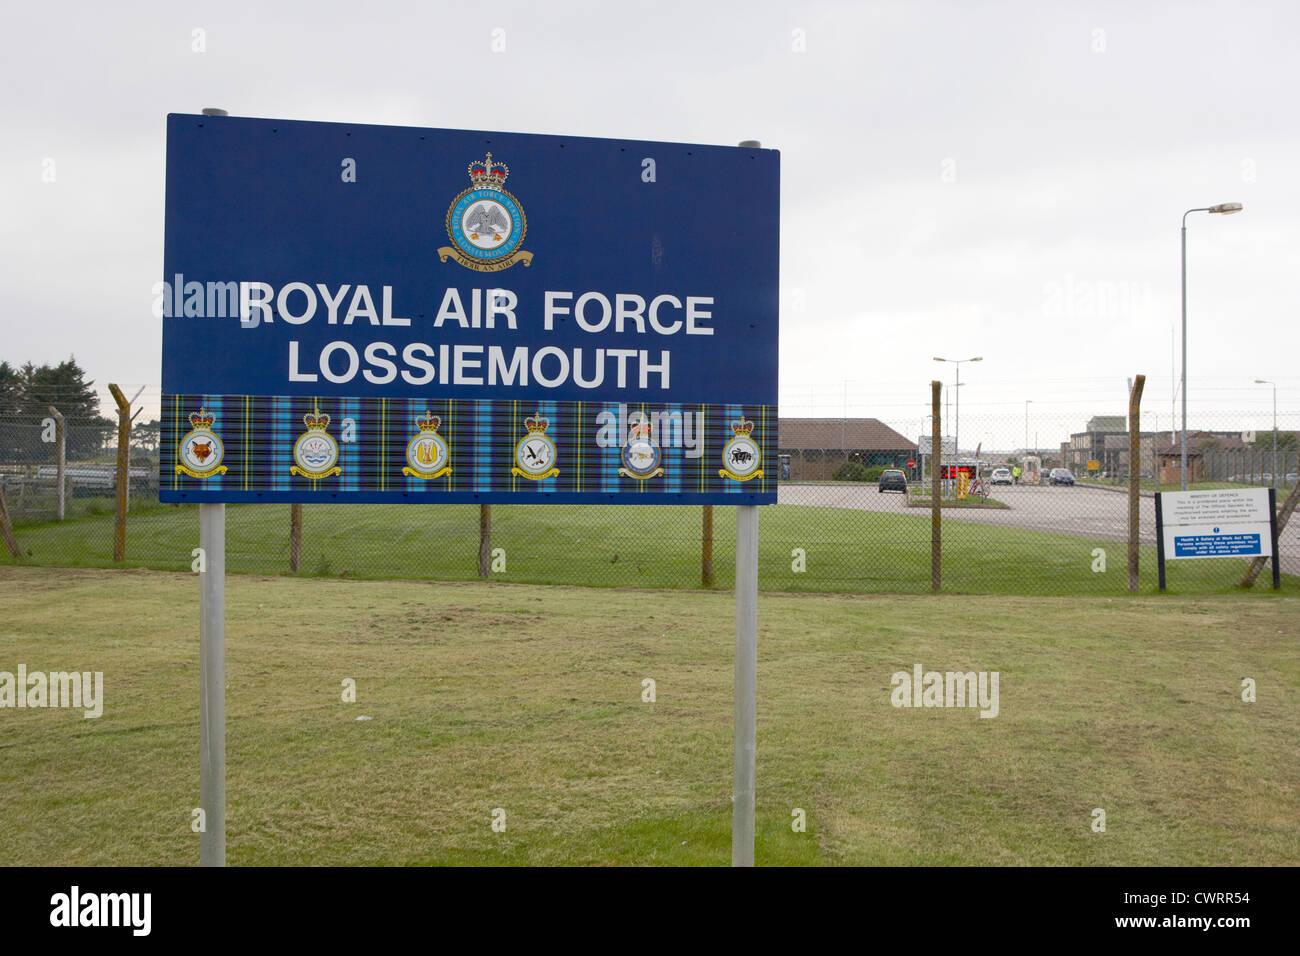 RAF Lossiemouth air force base scotland uk - Stock Image